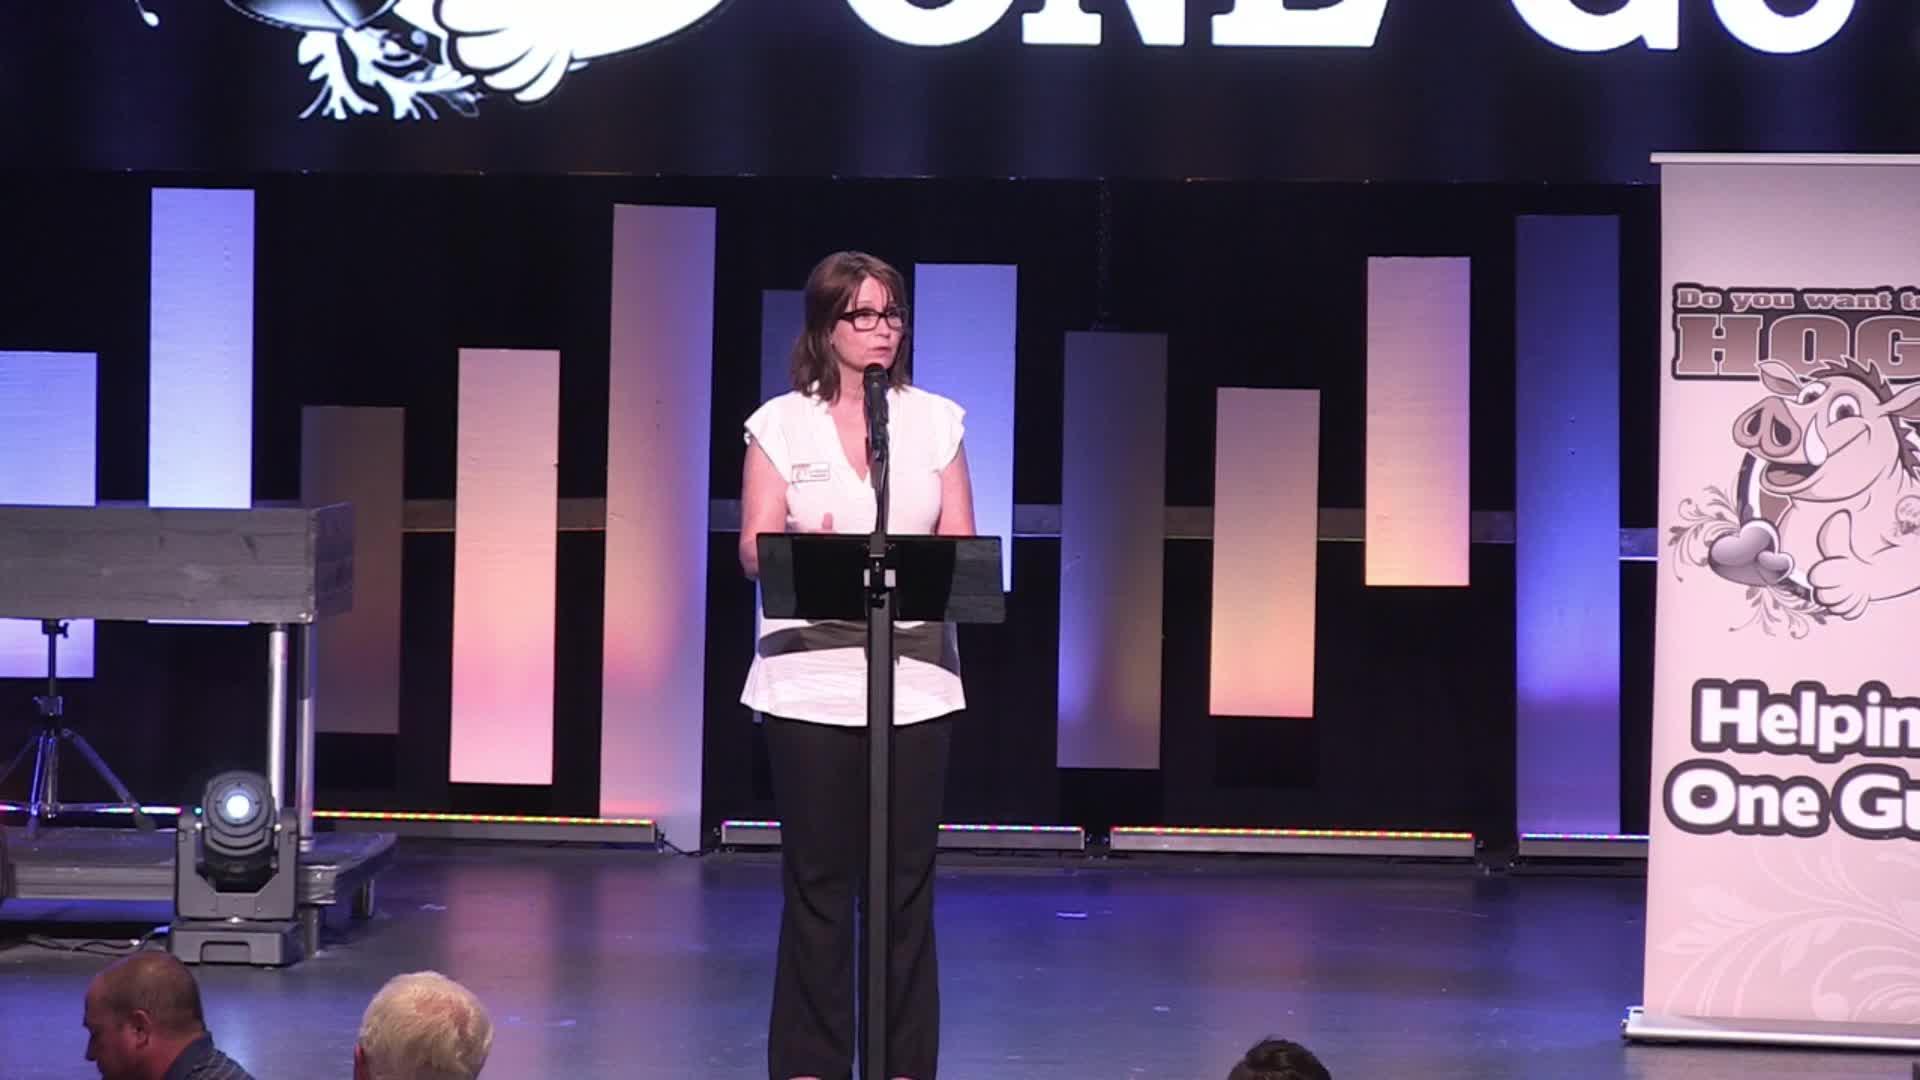 Lori DeForest, Chaplain